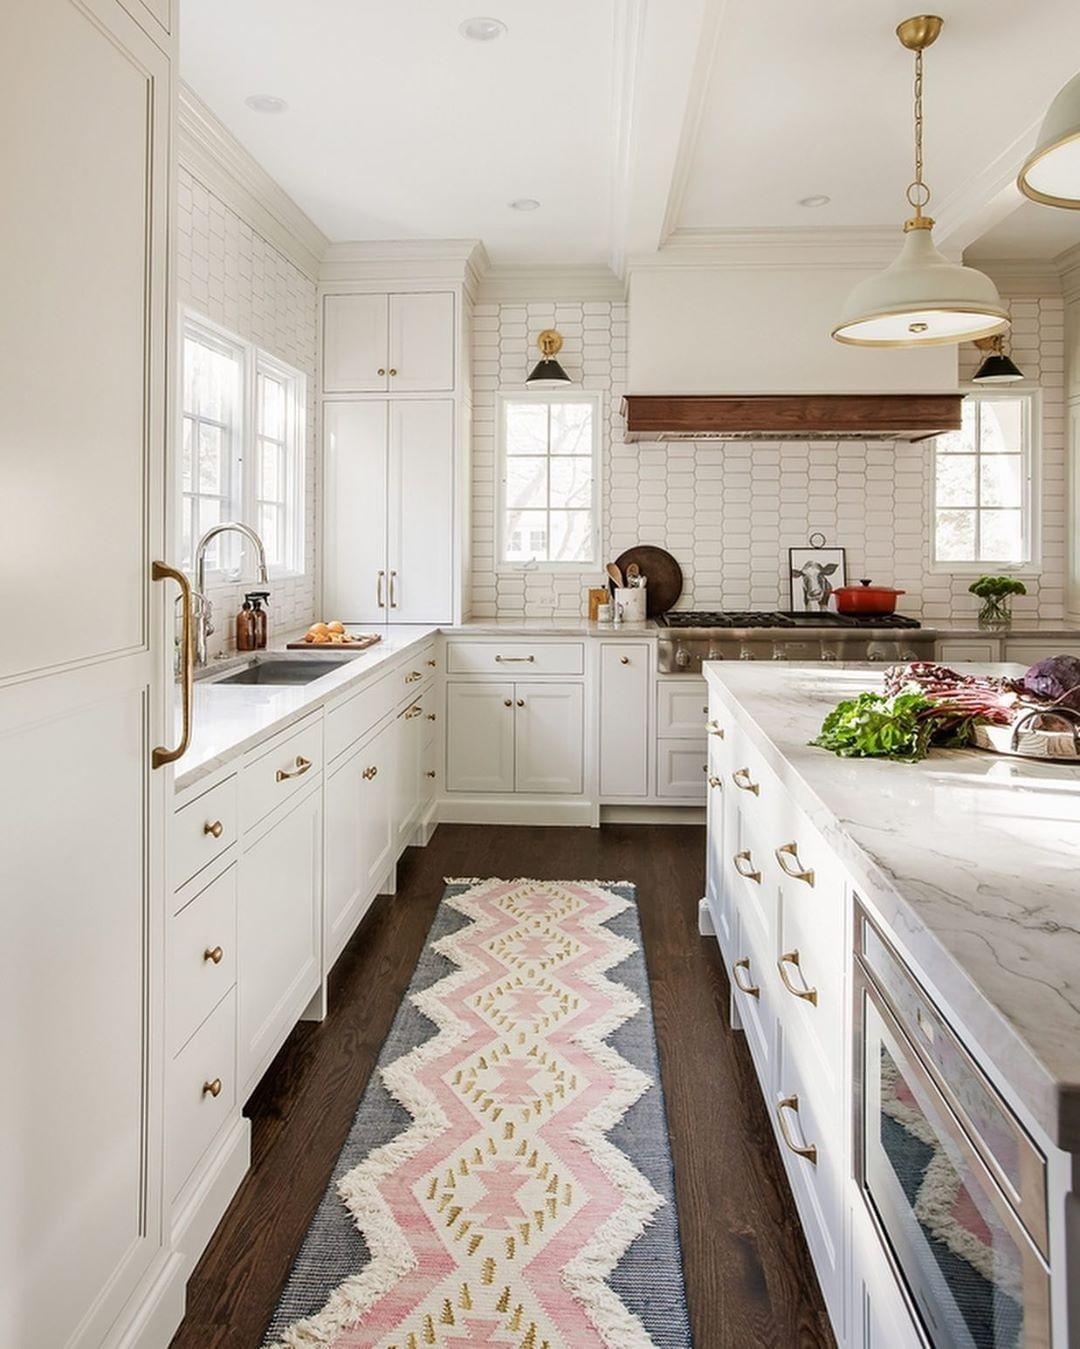 White kitchen with tile backsplash and blue and pink runner rug ...